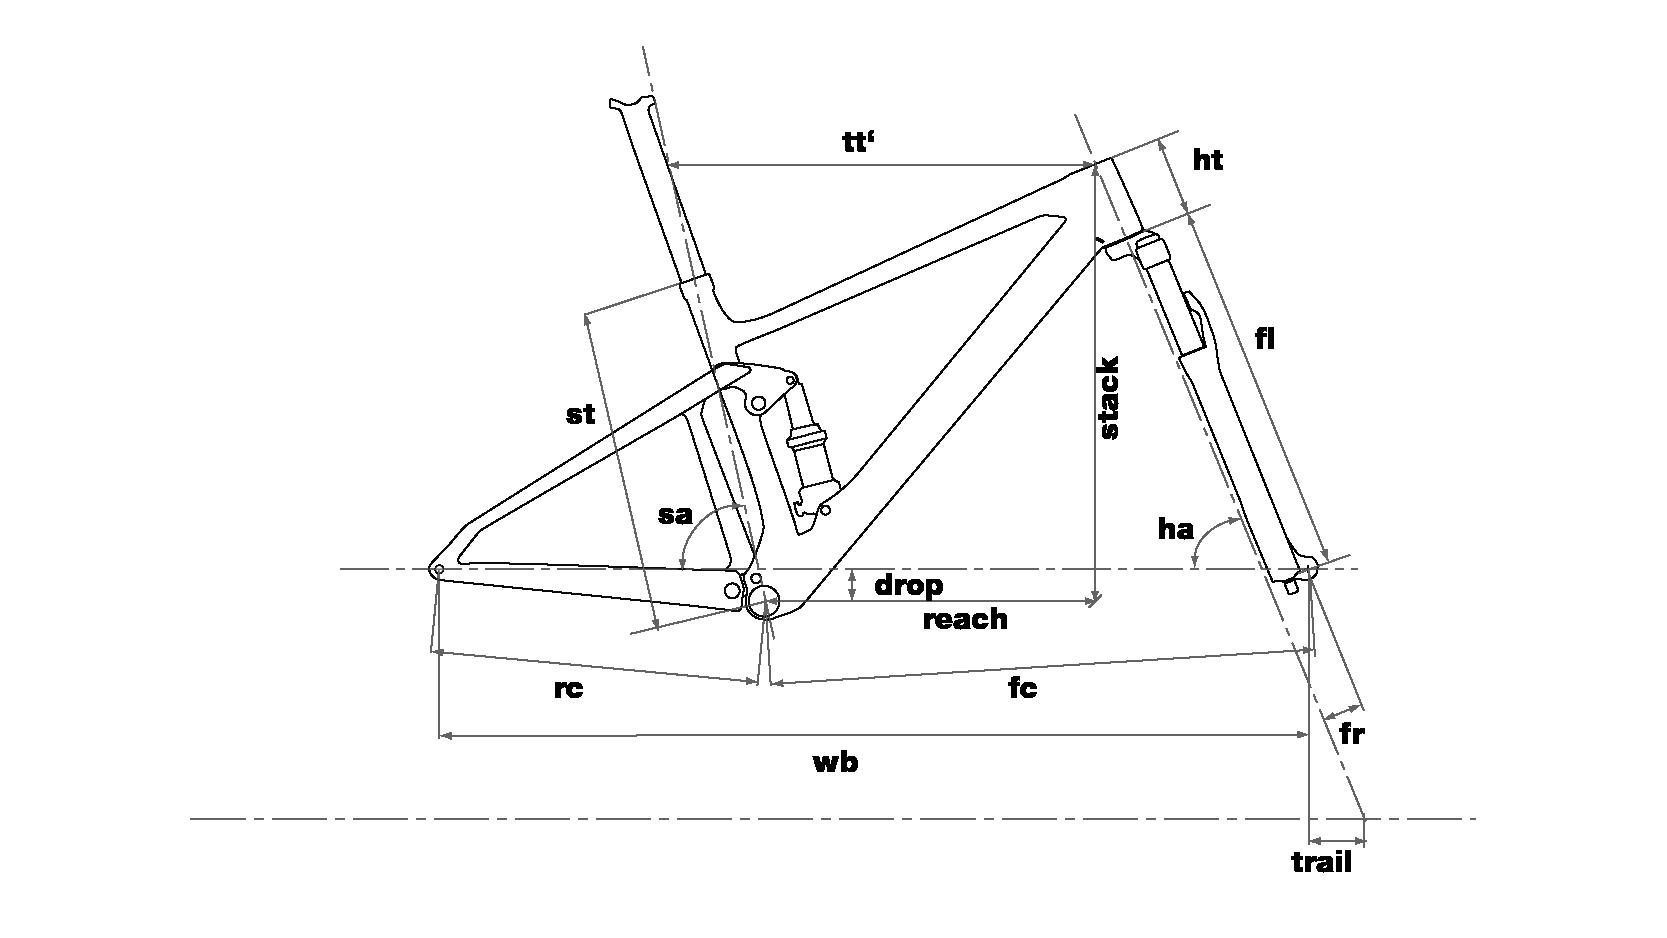 Geometry – BMC Fourstroke 01 LT TWO